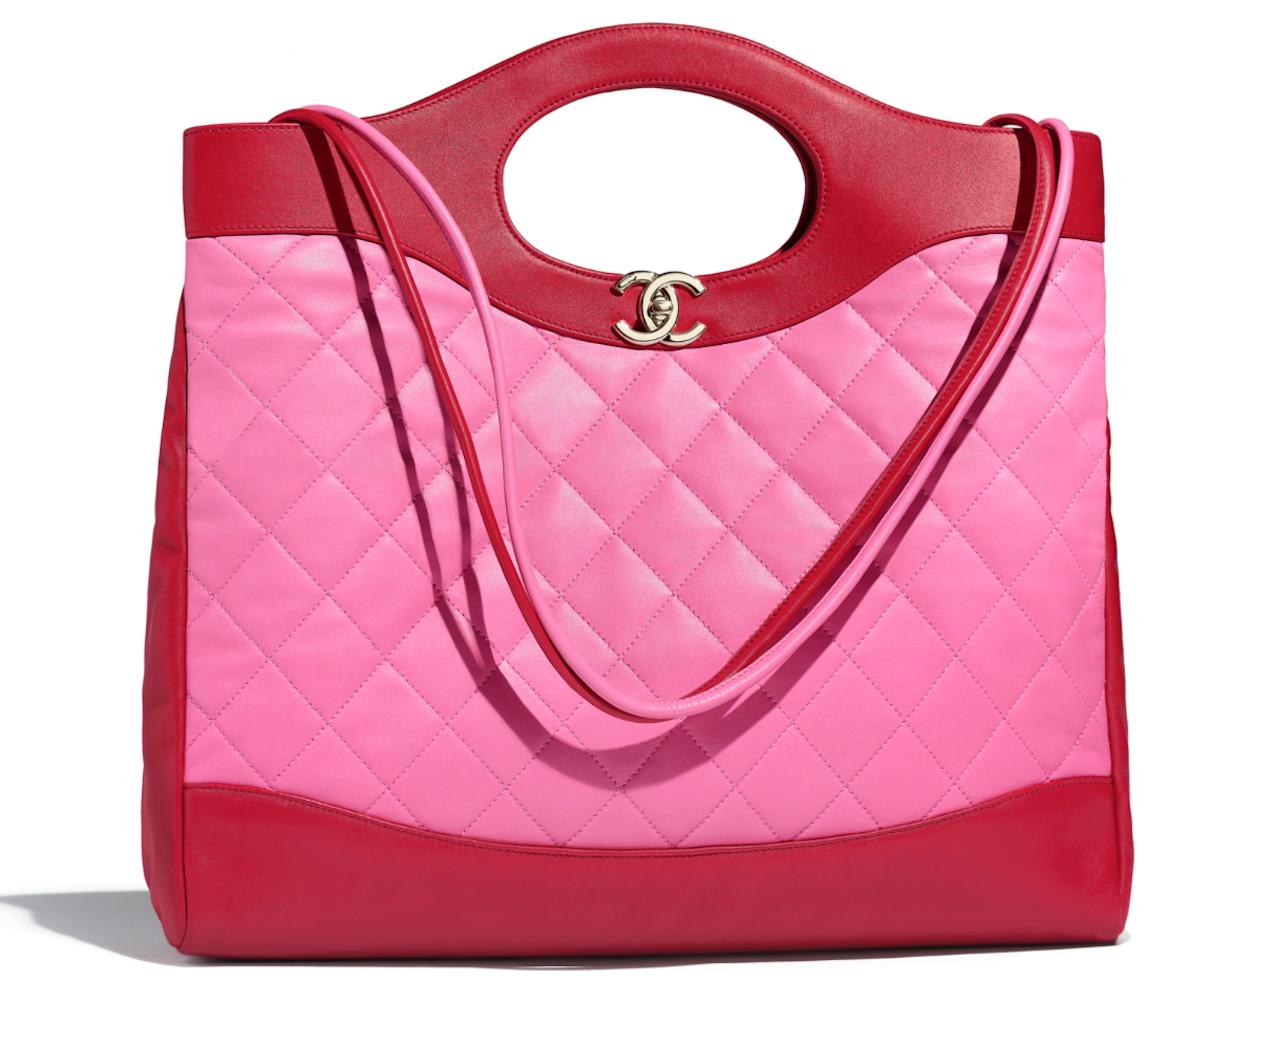 00eef1abacf5 Chanel s New 31 Hits the Website - PurseBop